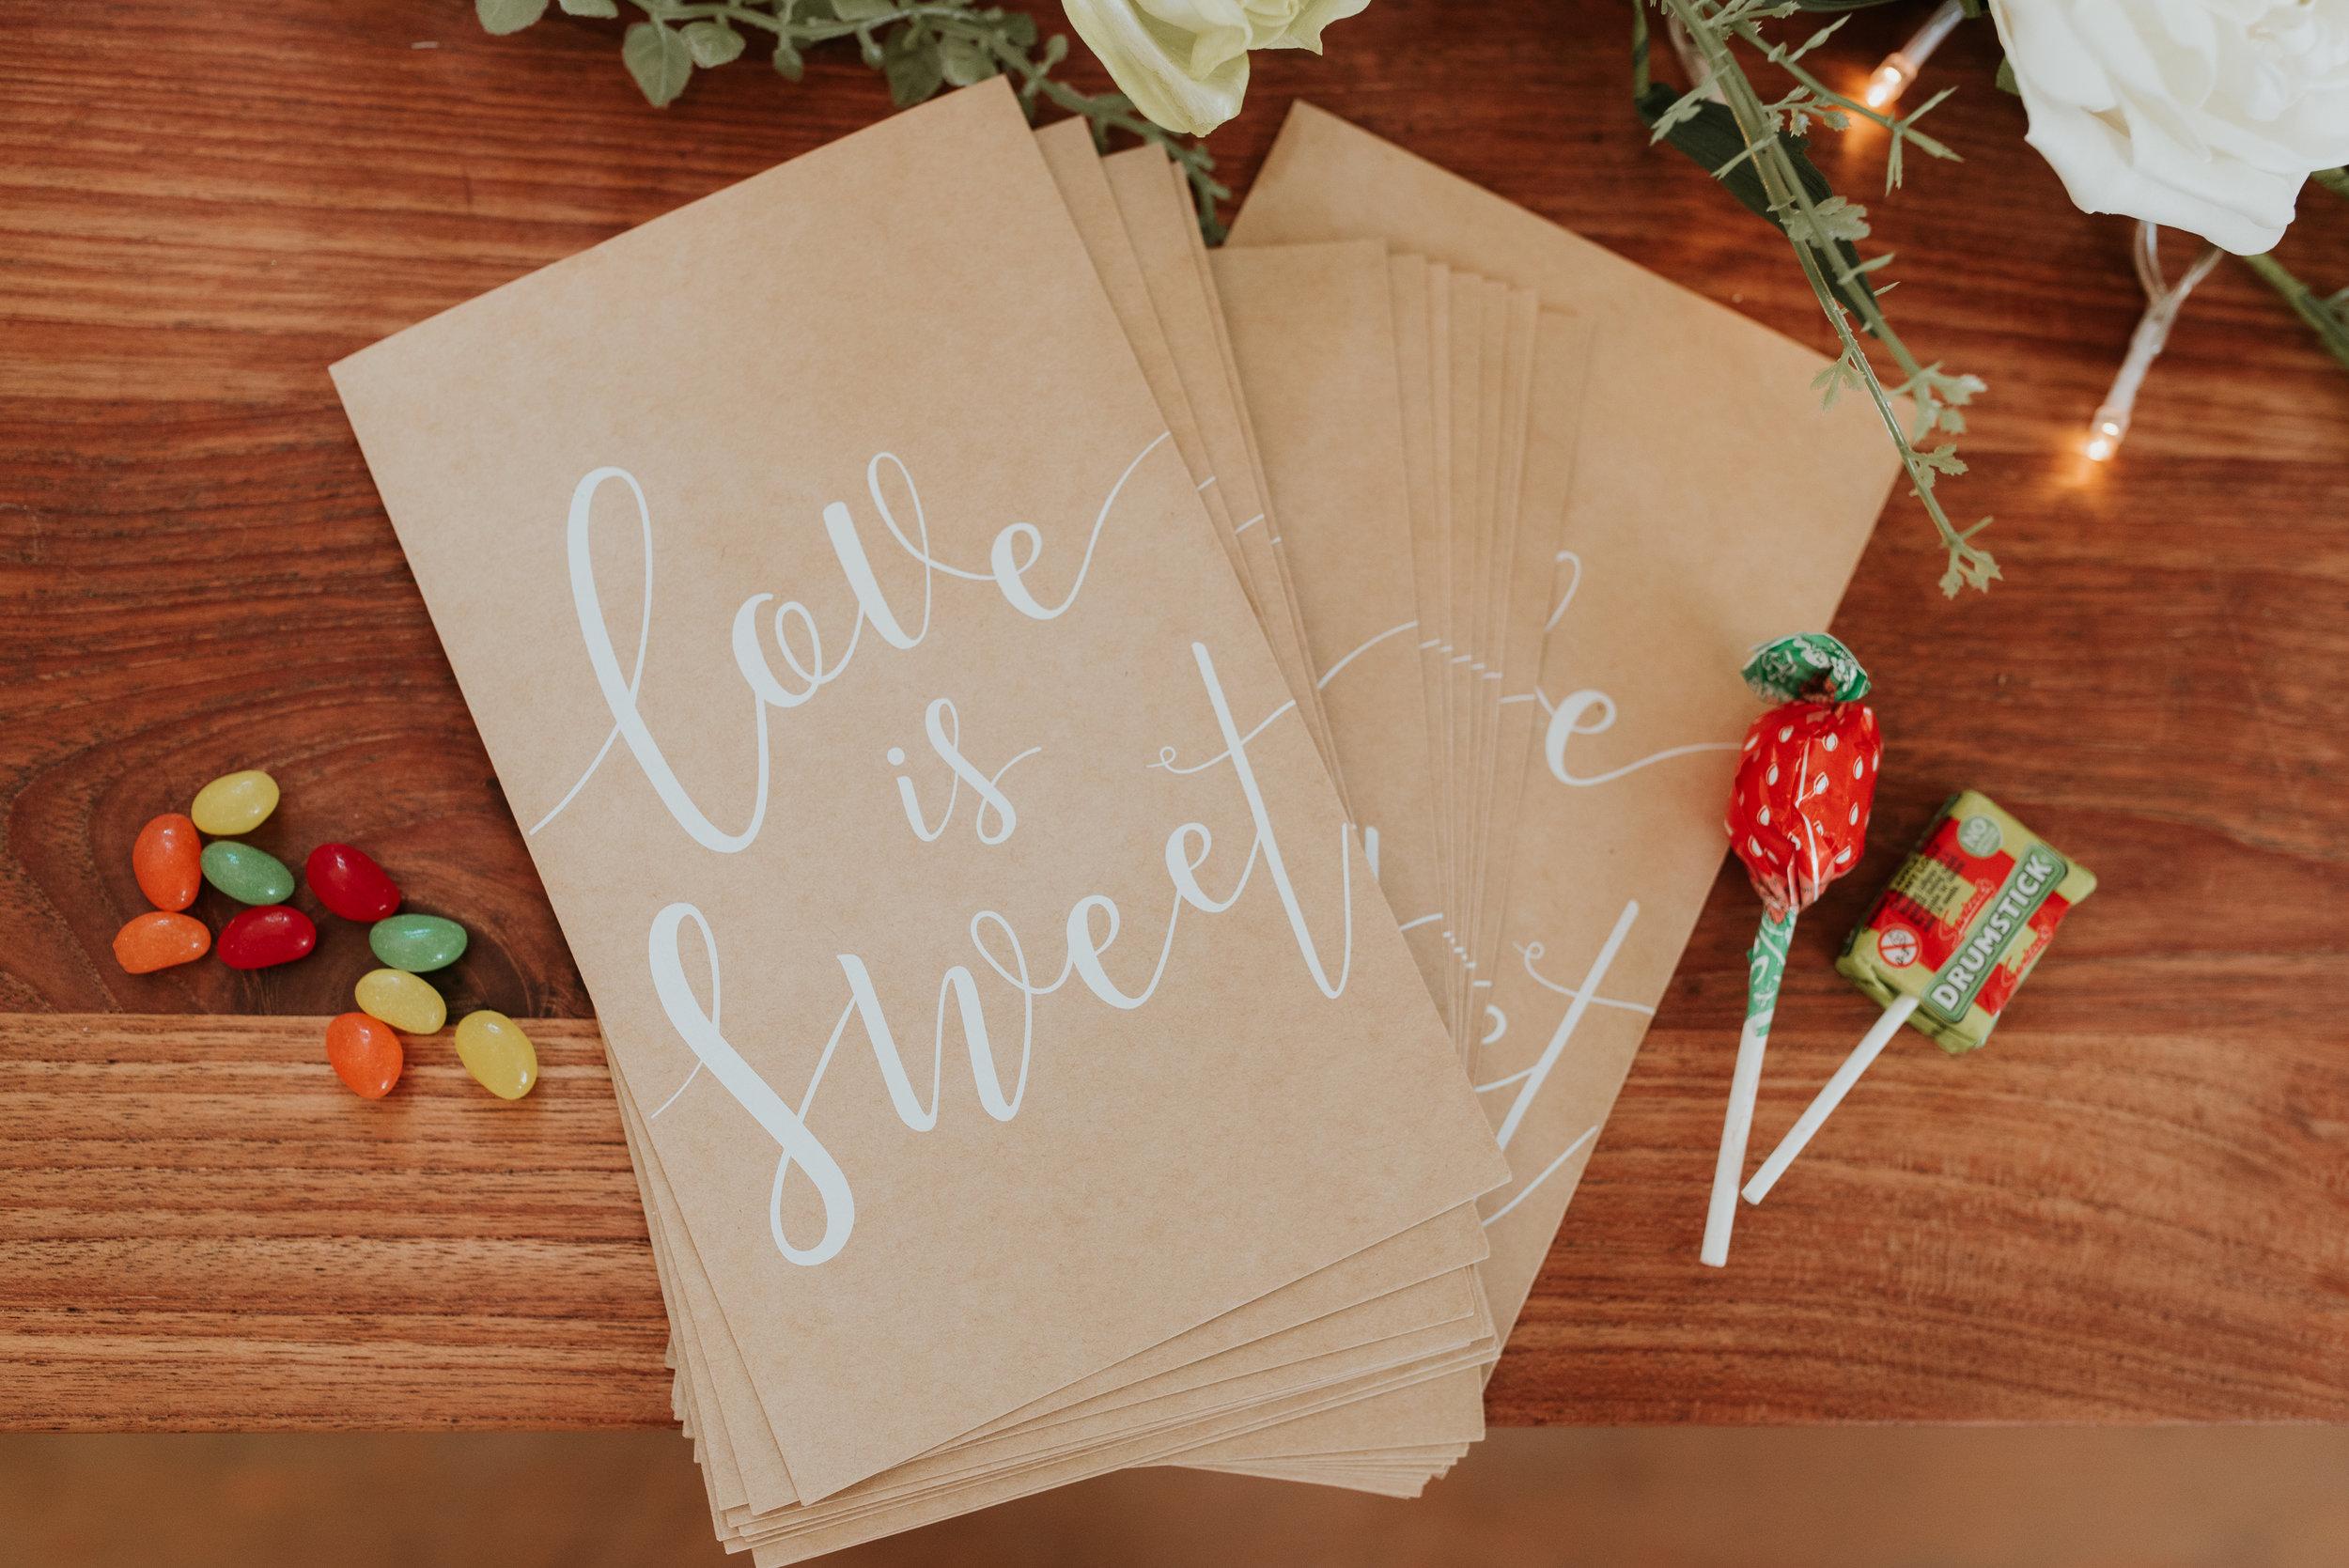 Oxfordshire-wedding-photographer-65.jpg